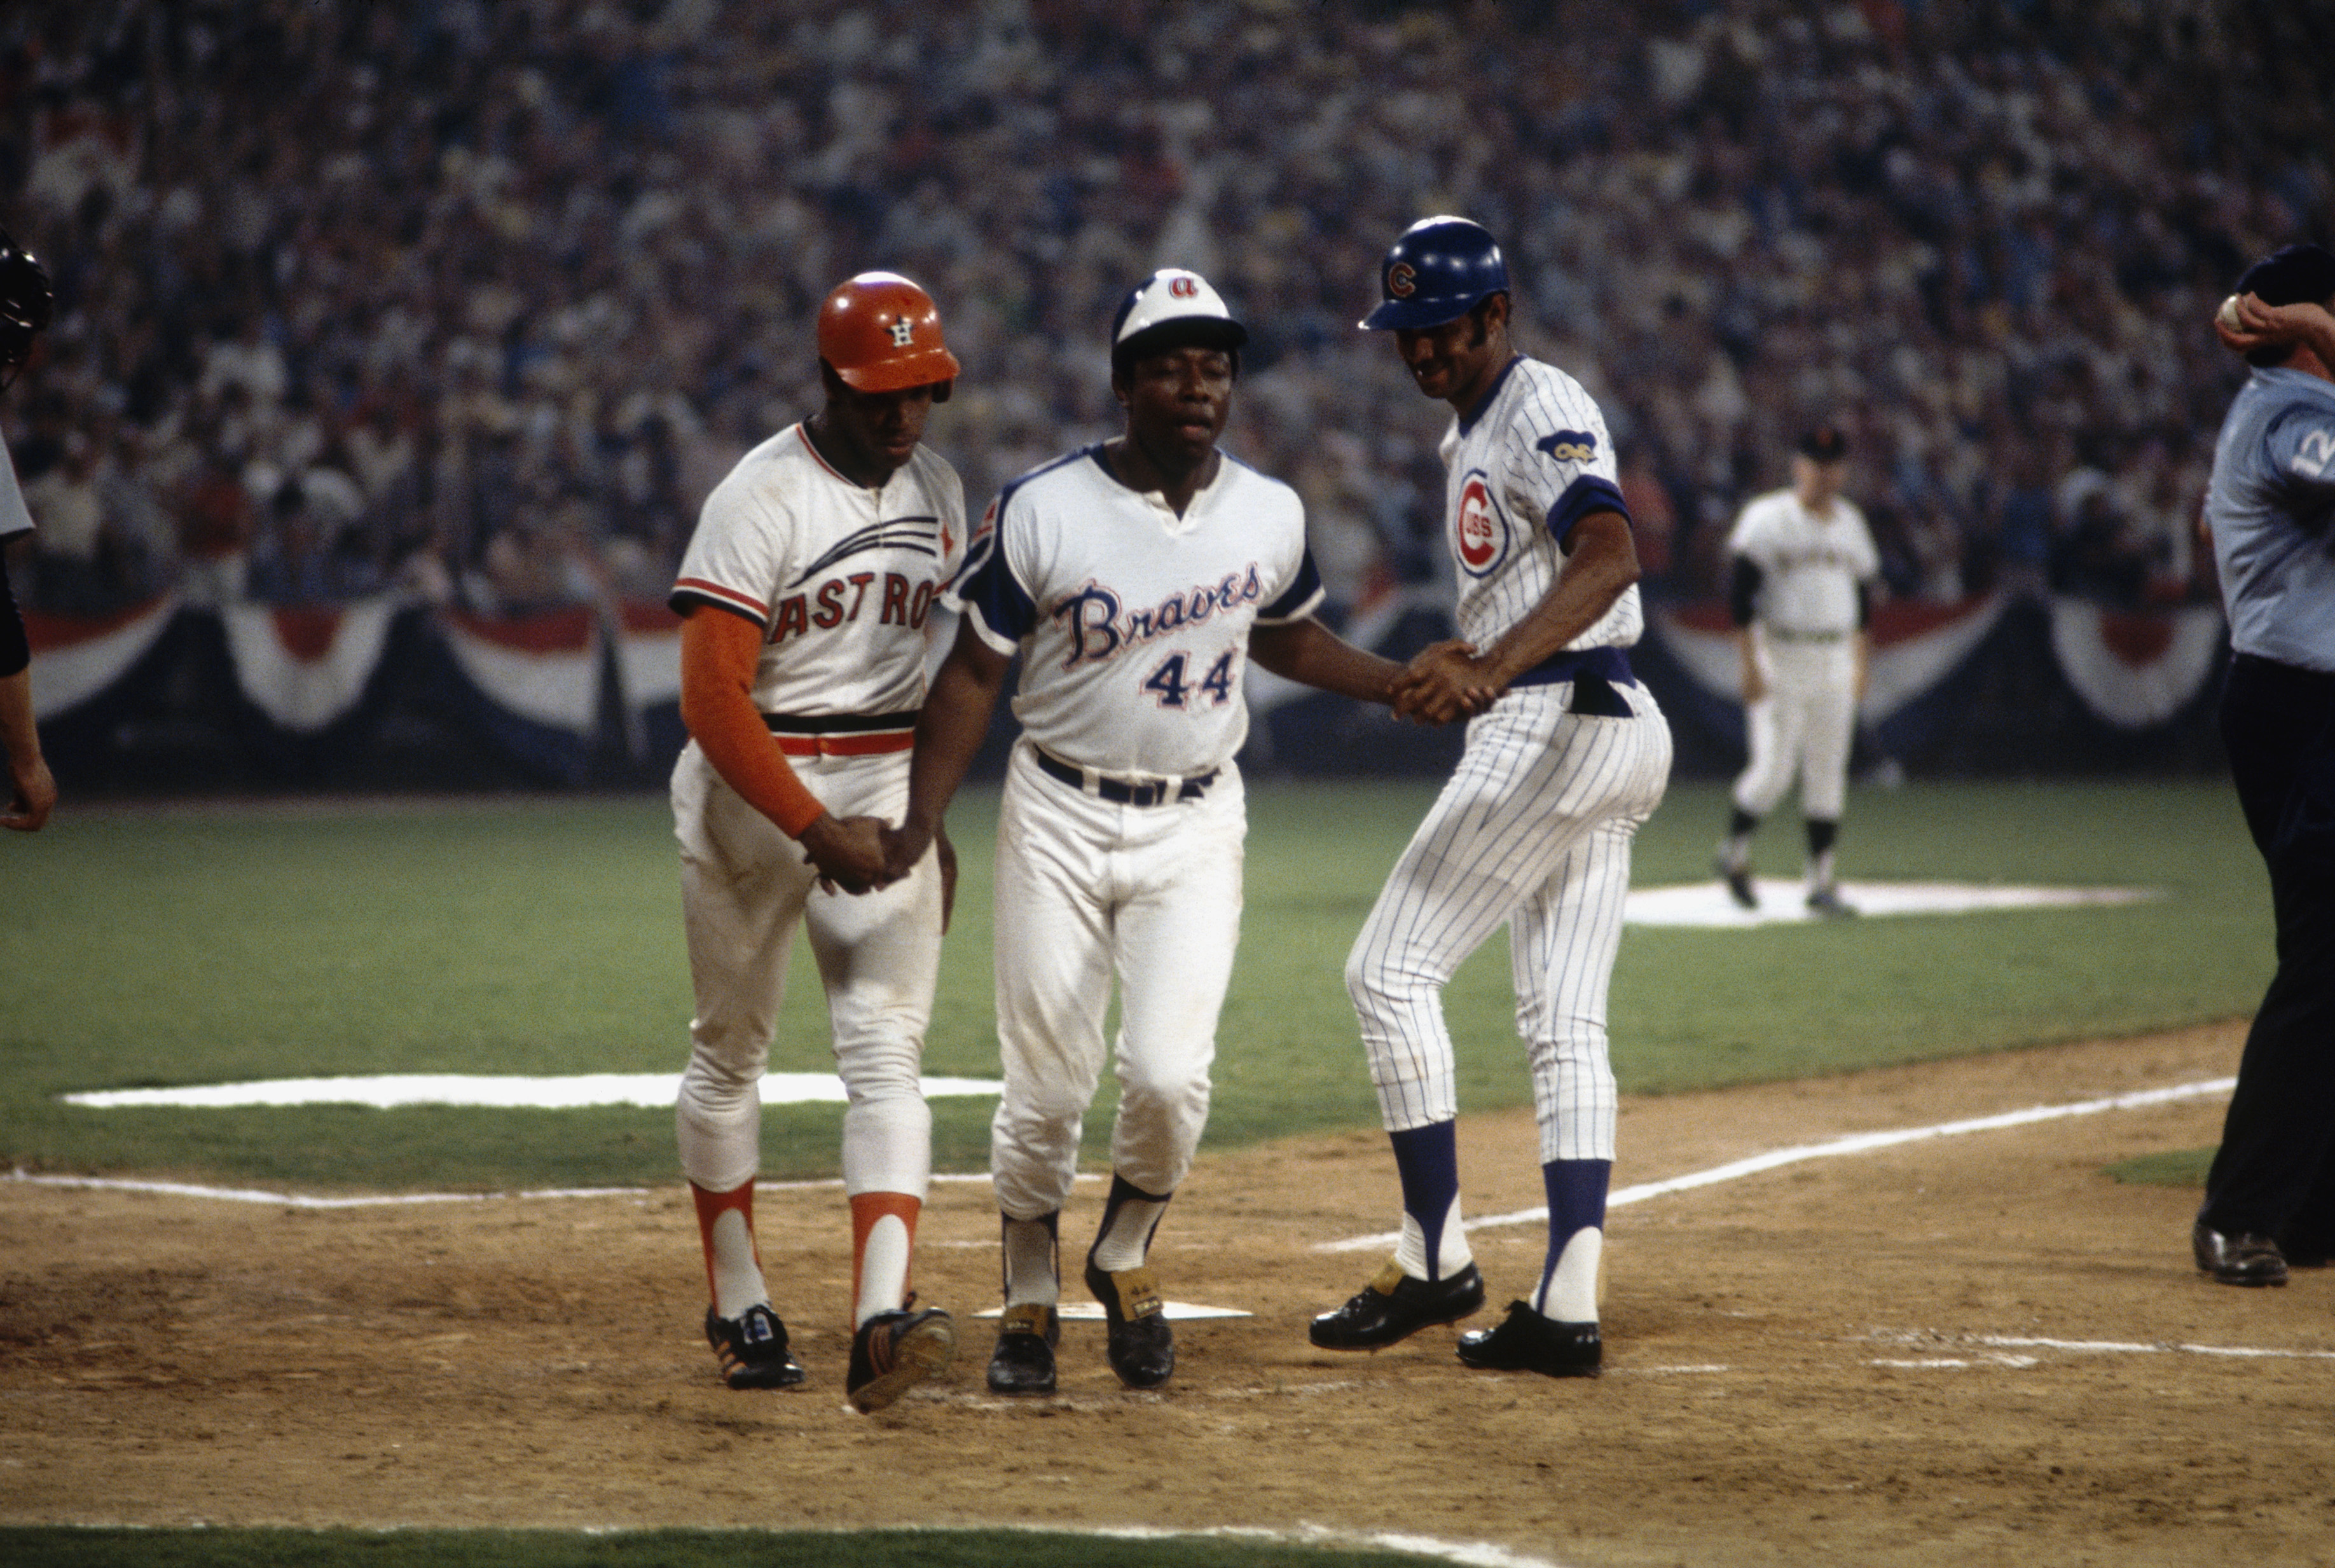 1972 MLB All Star Game